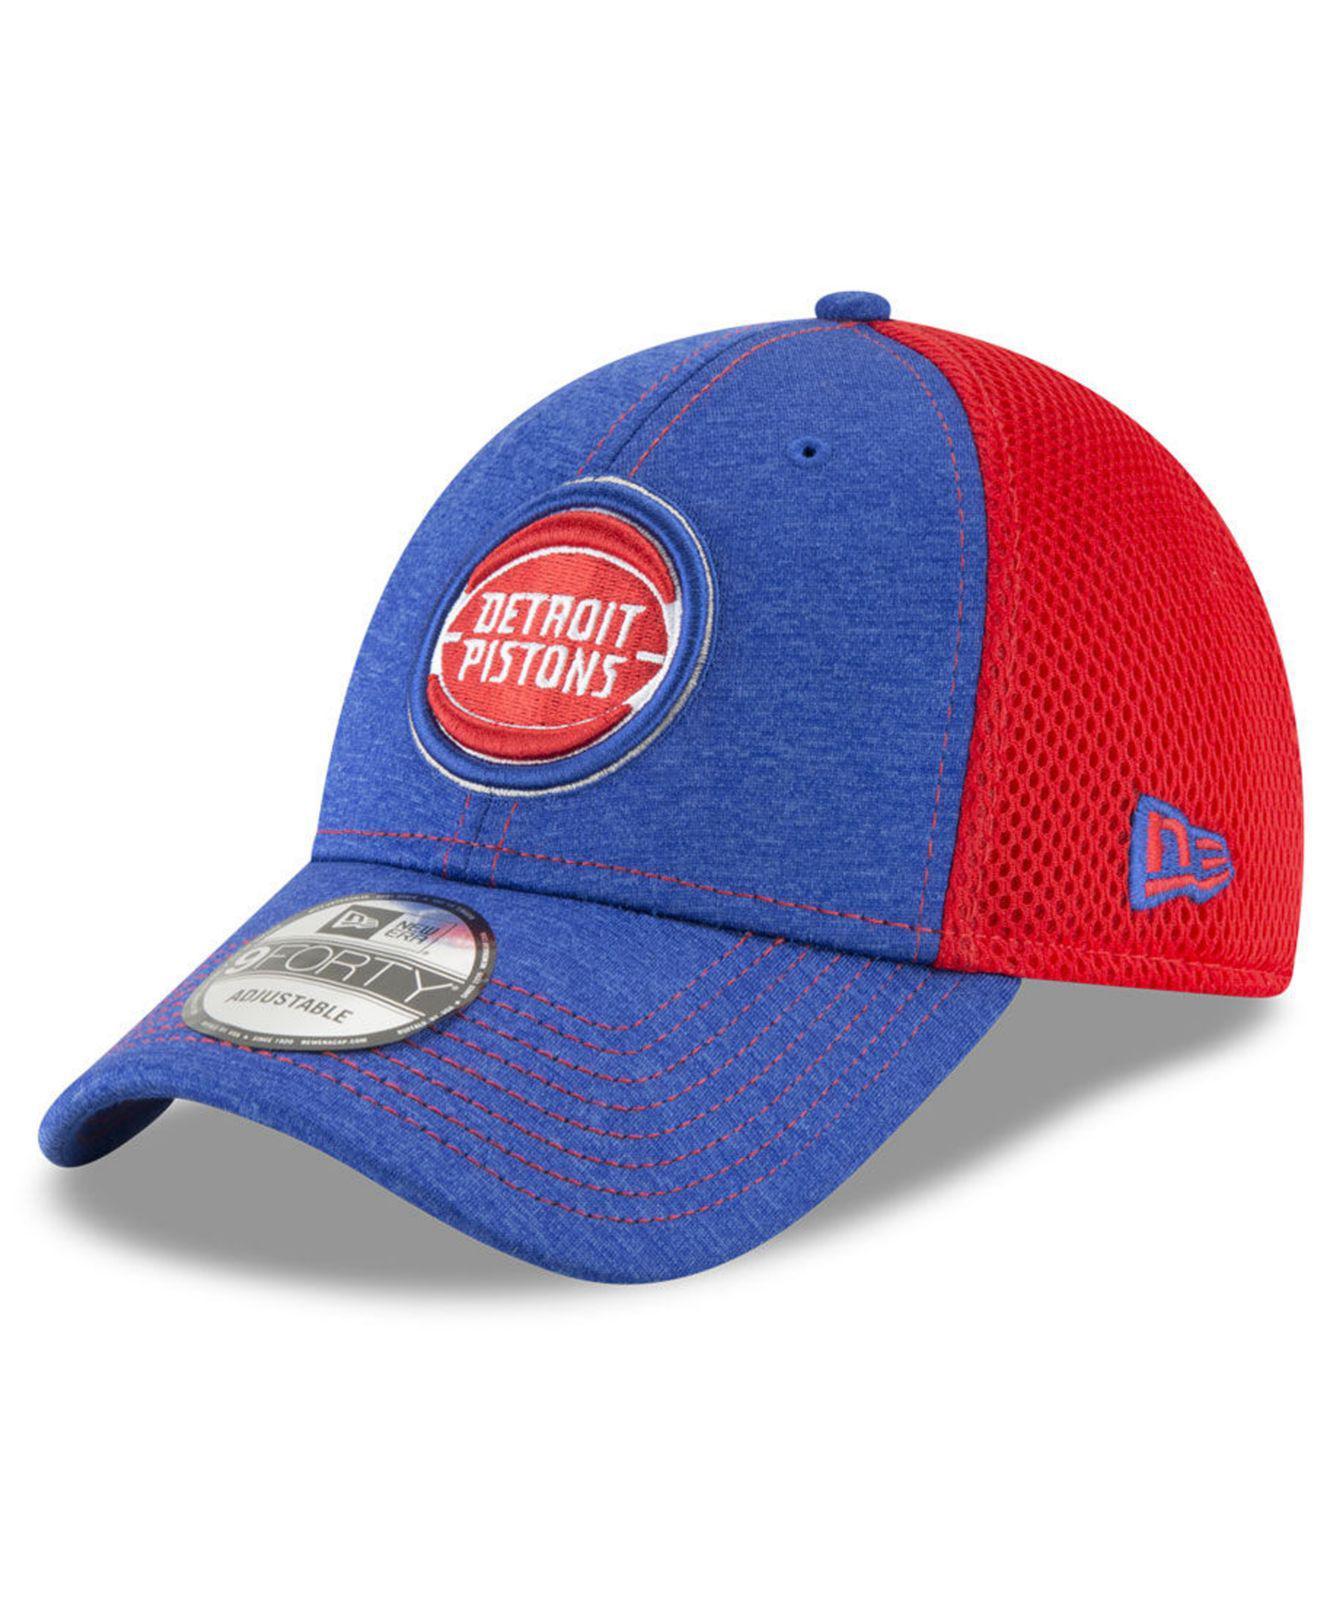 308096be2ff Lyst - KTZ Detroit Pistons Shadow Turn 2 Adjustable Cap in Blue for Men